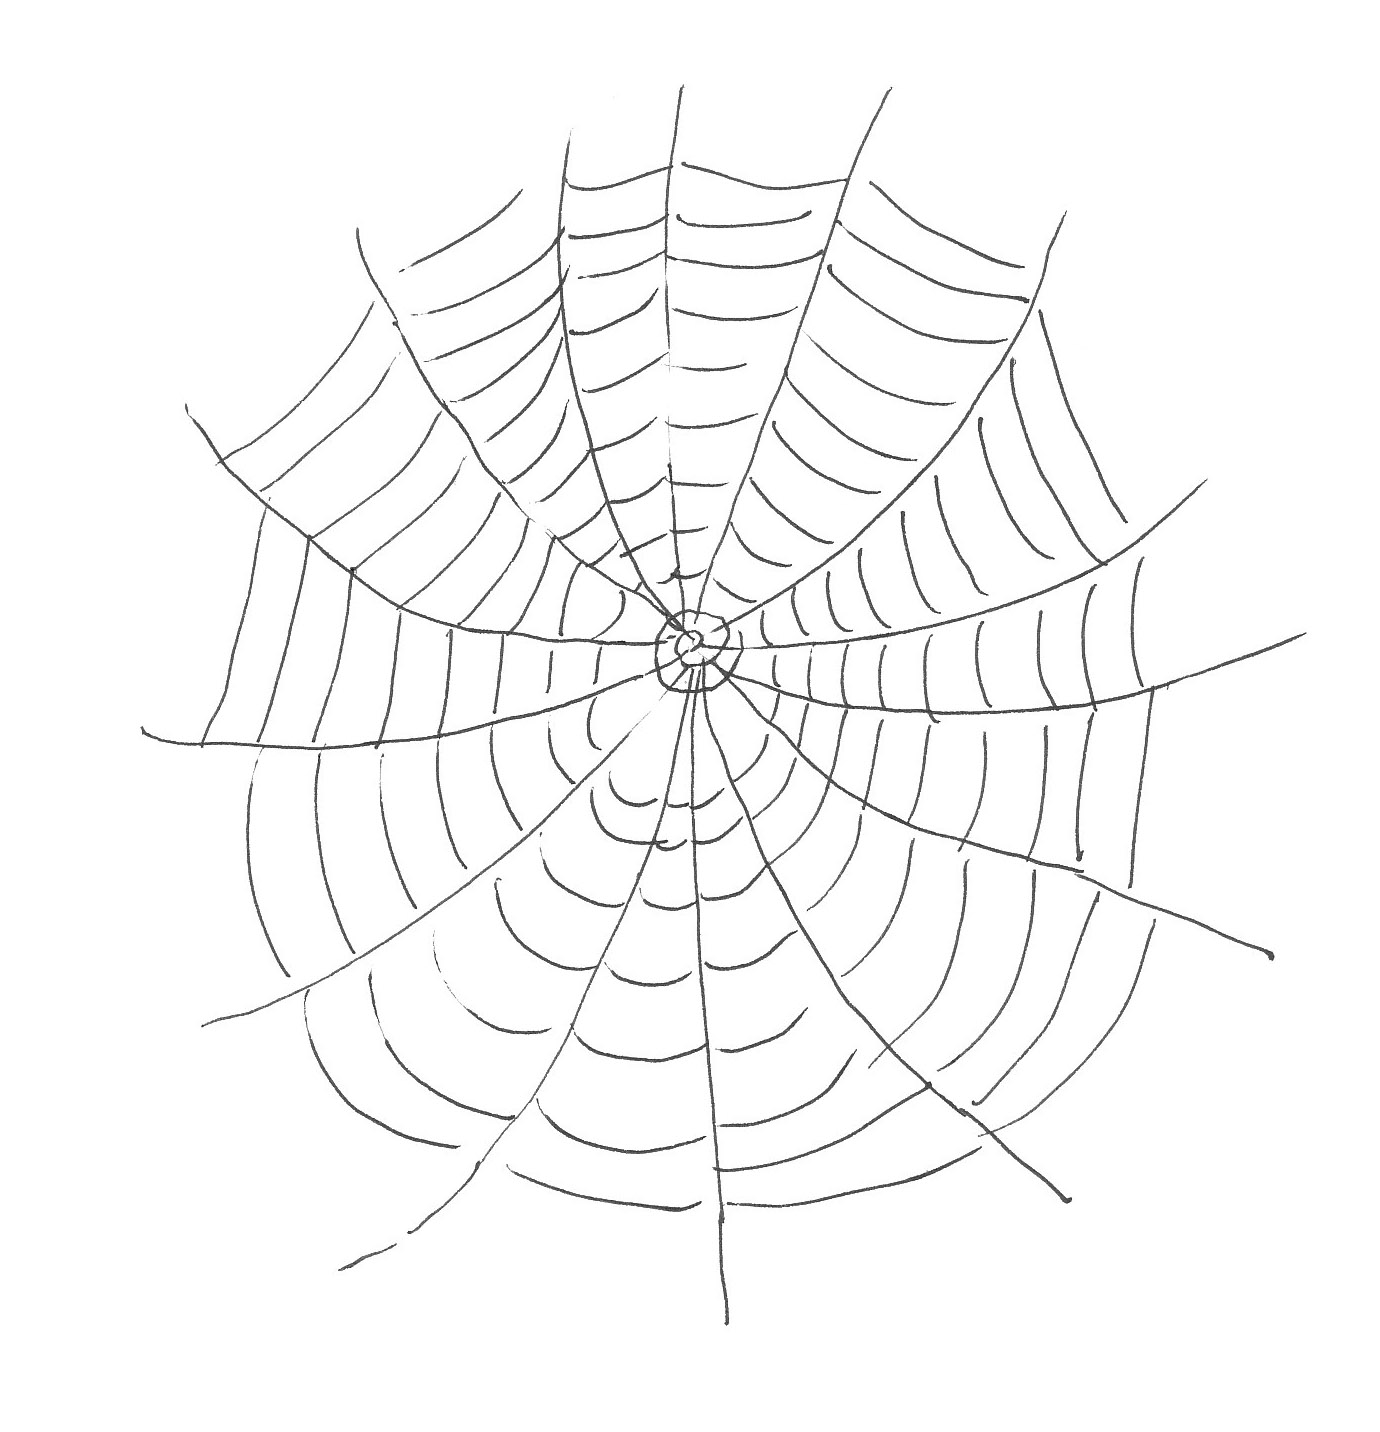 Drawn spider web detailed Web atrinrayaneh Page com Spider